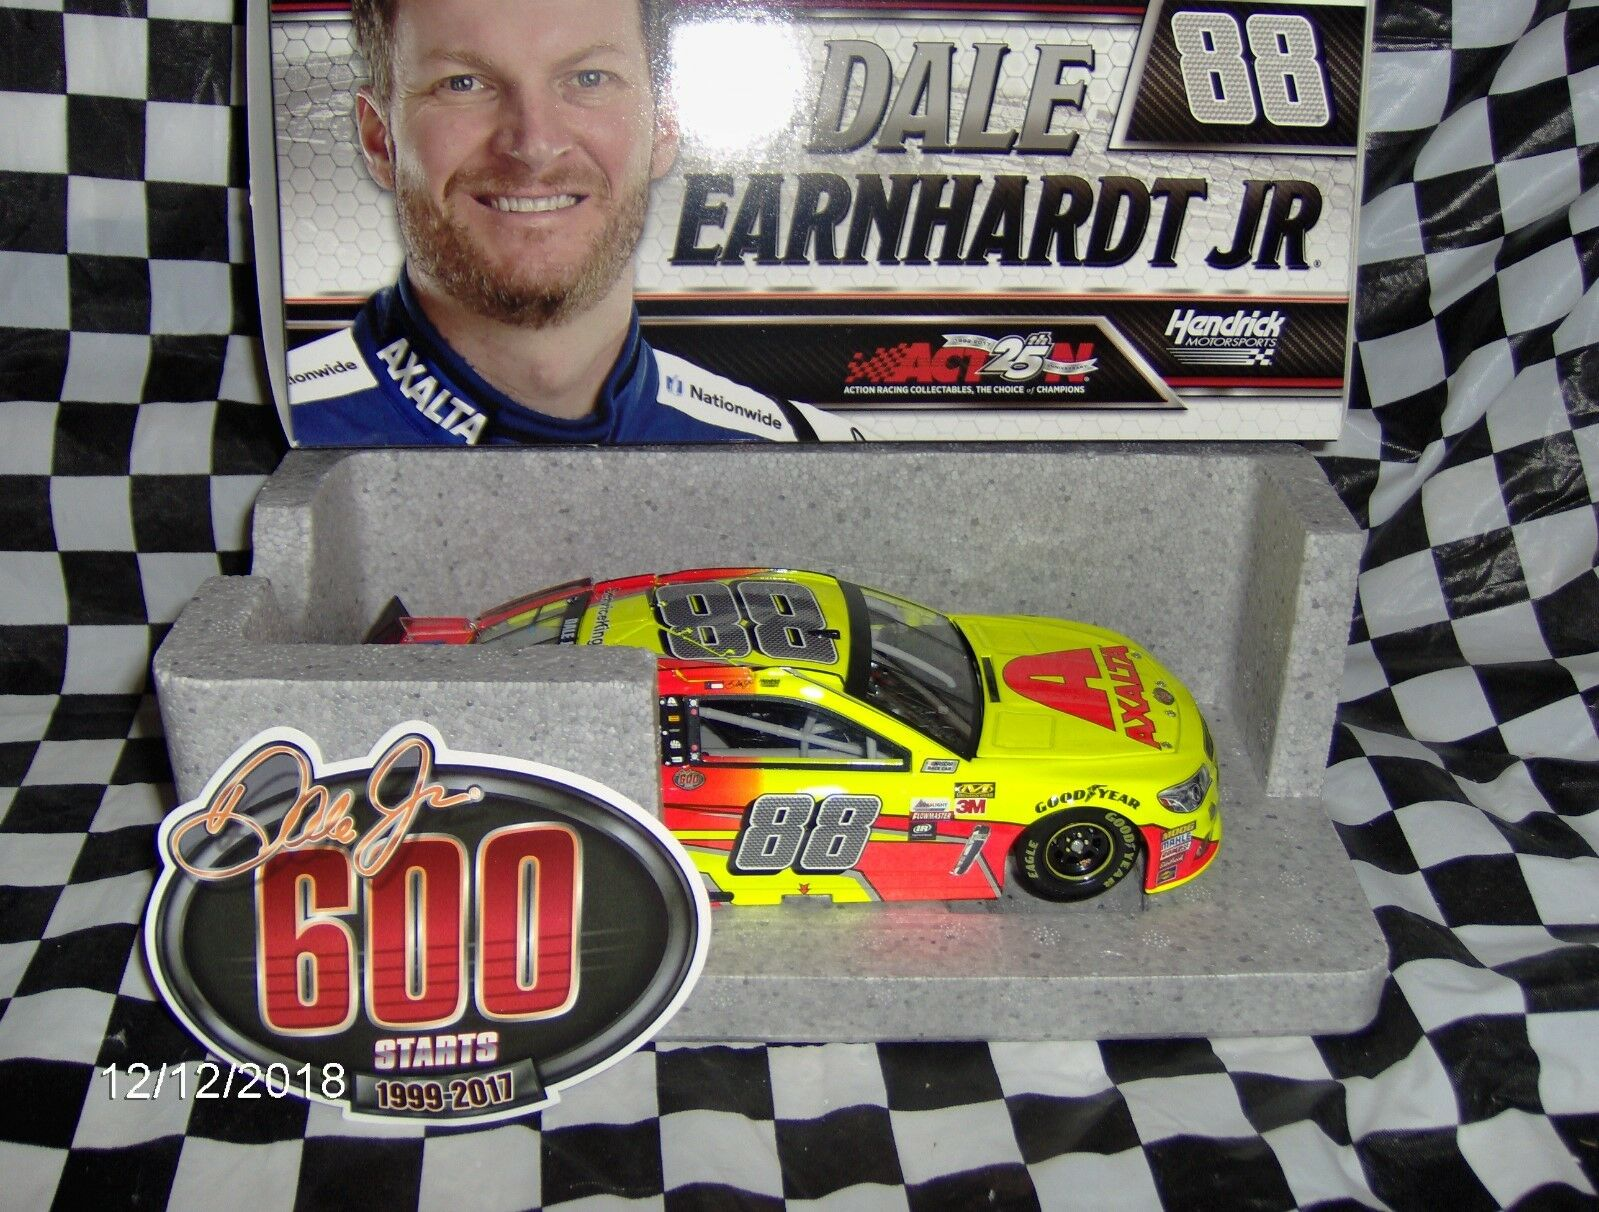 2017 Dale Earnhardt Jr. Axalta Service King 600th Starts 1 24th